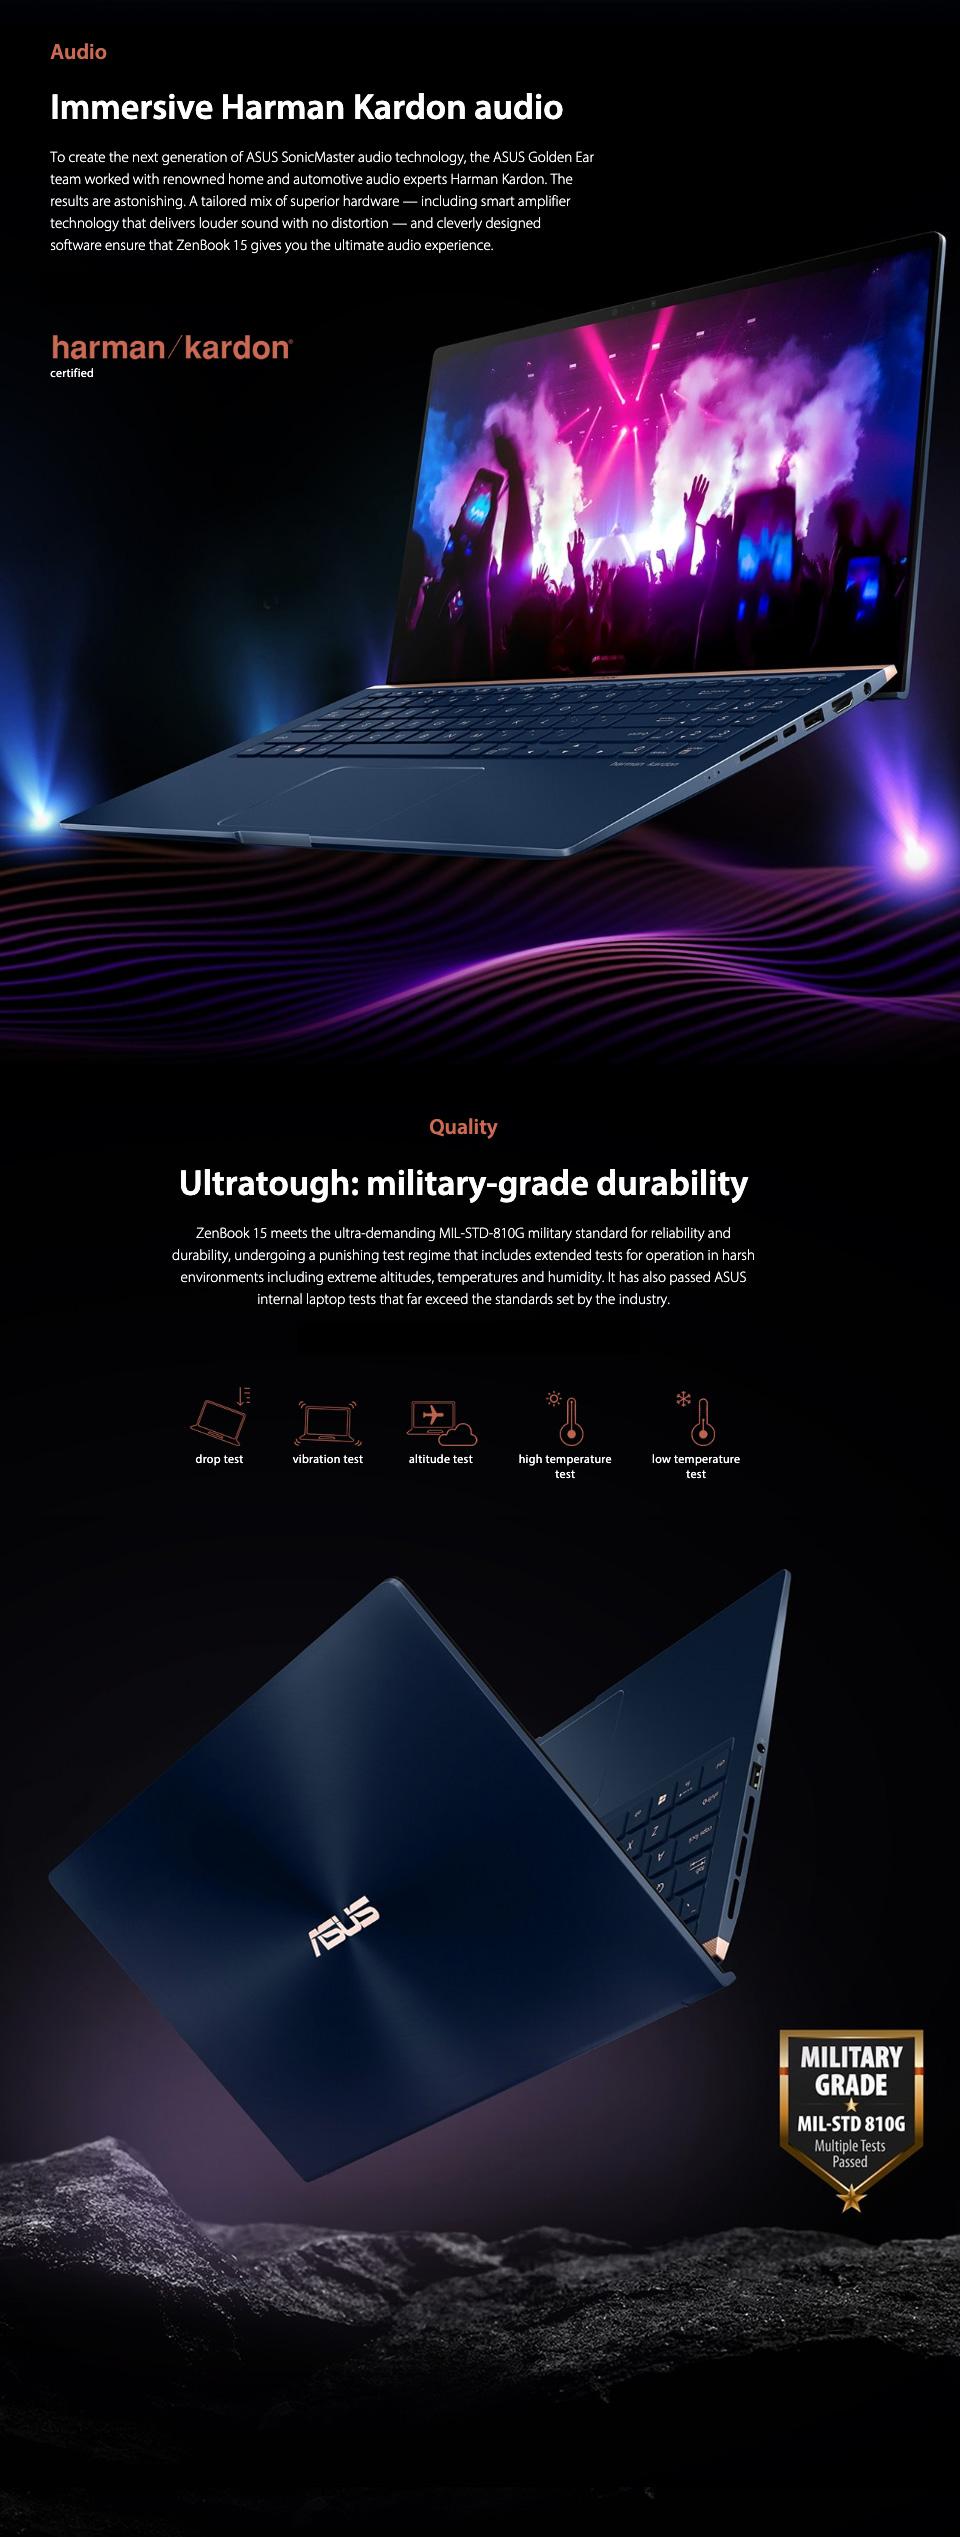 ASUS ZenBook Core i7-8565U GTX 1050 FHD 15.6in Laptop features 6